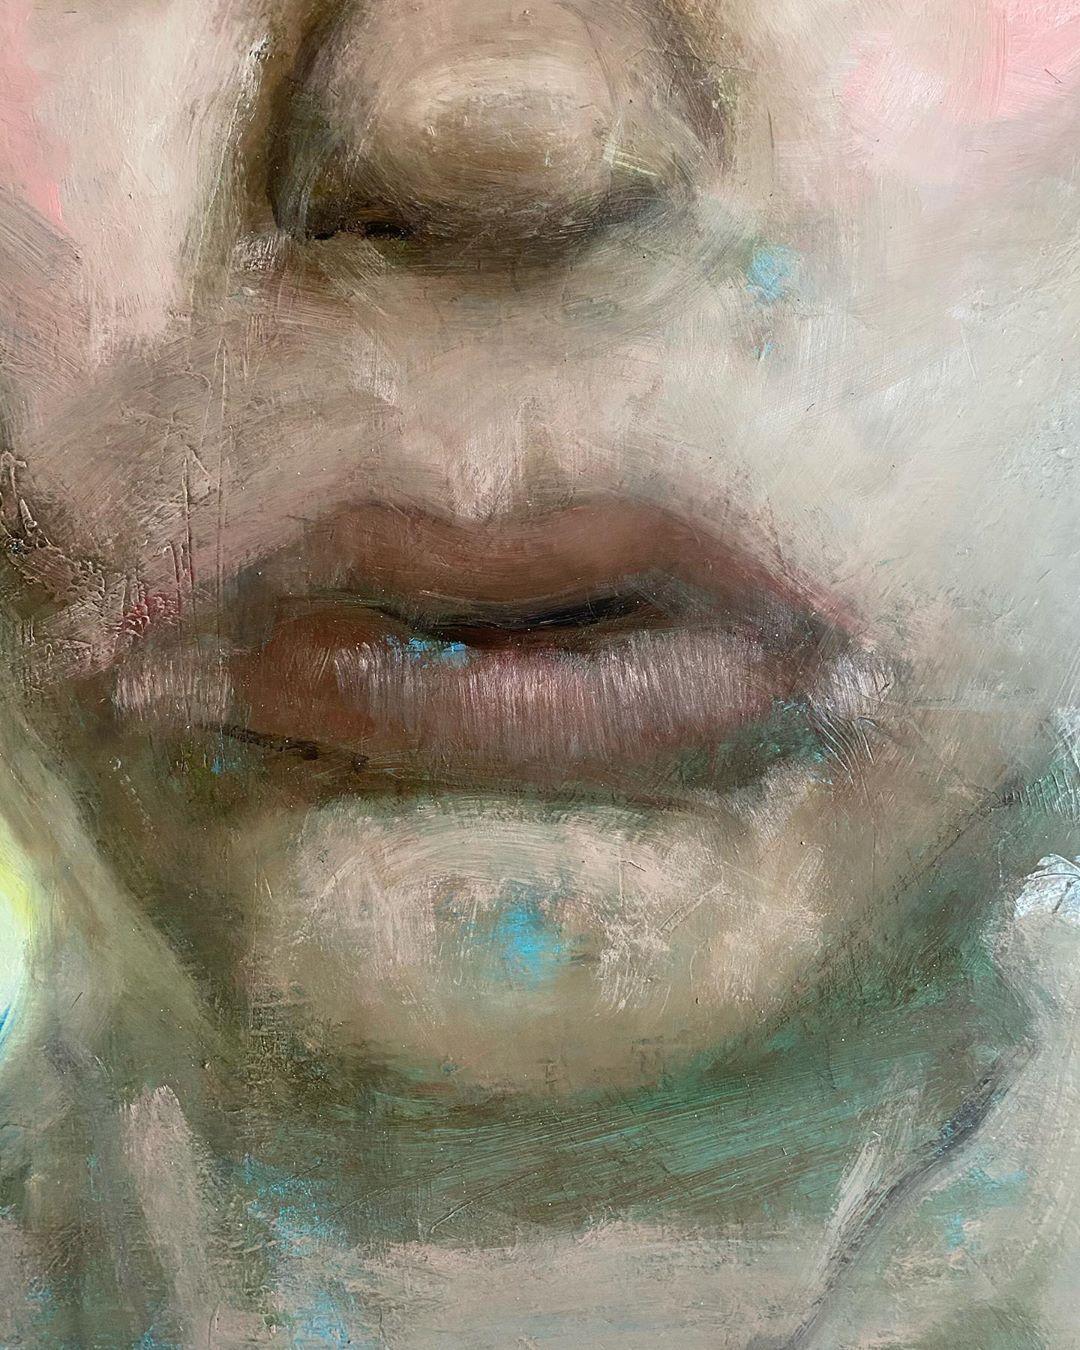 "Agnieszka Ceccarelli on Instagram: ""#portraitpainting #agnieszkaceccarelli #fineart #oiloncanvas #oilpainting #contemporarypainting #contemporary #contemporaryart #abstractart…"""